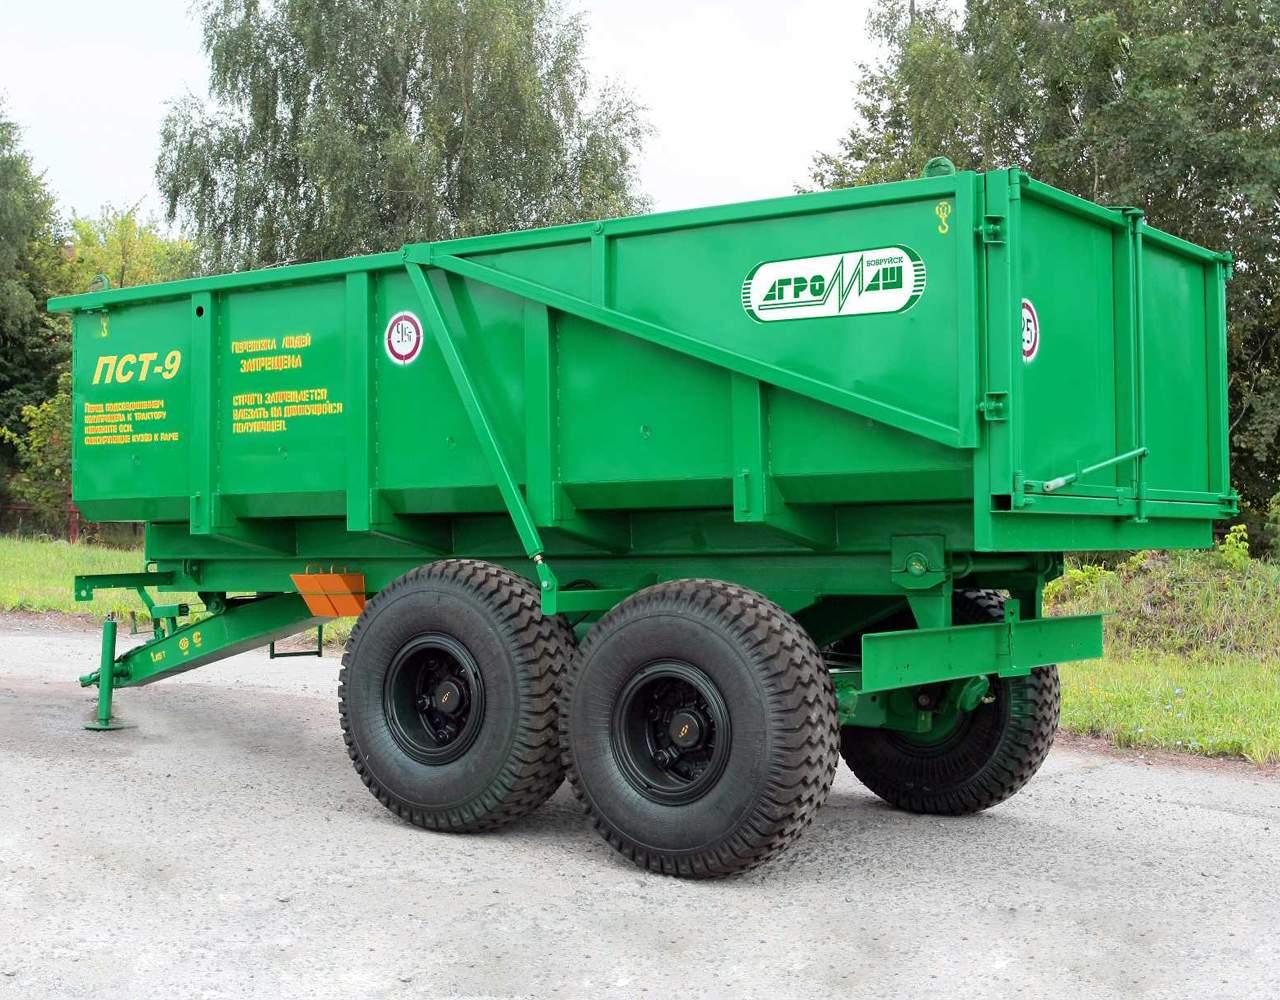 pricep-traktornyj-pst-9